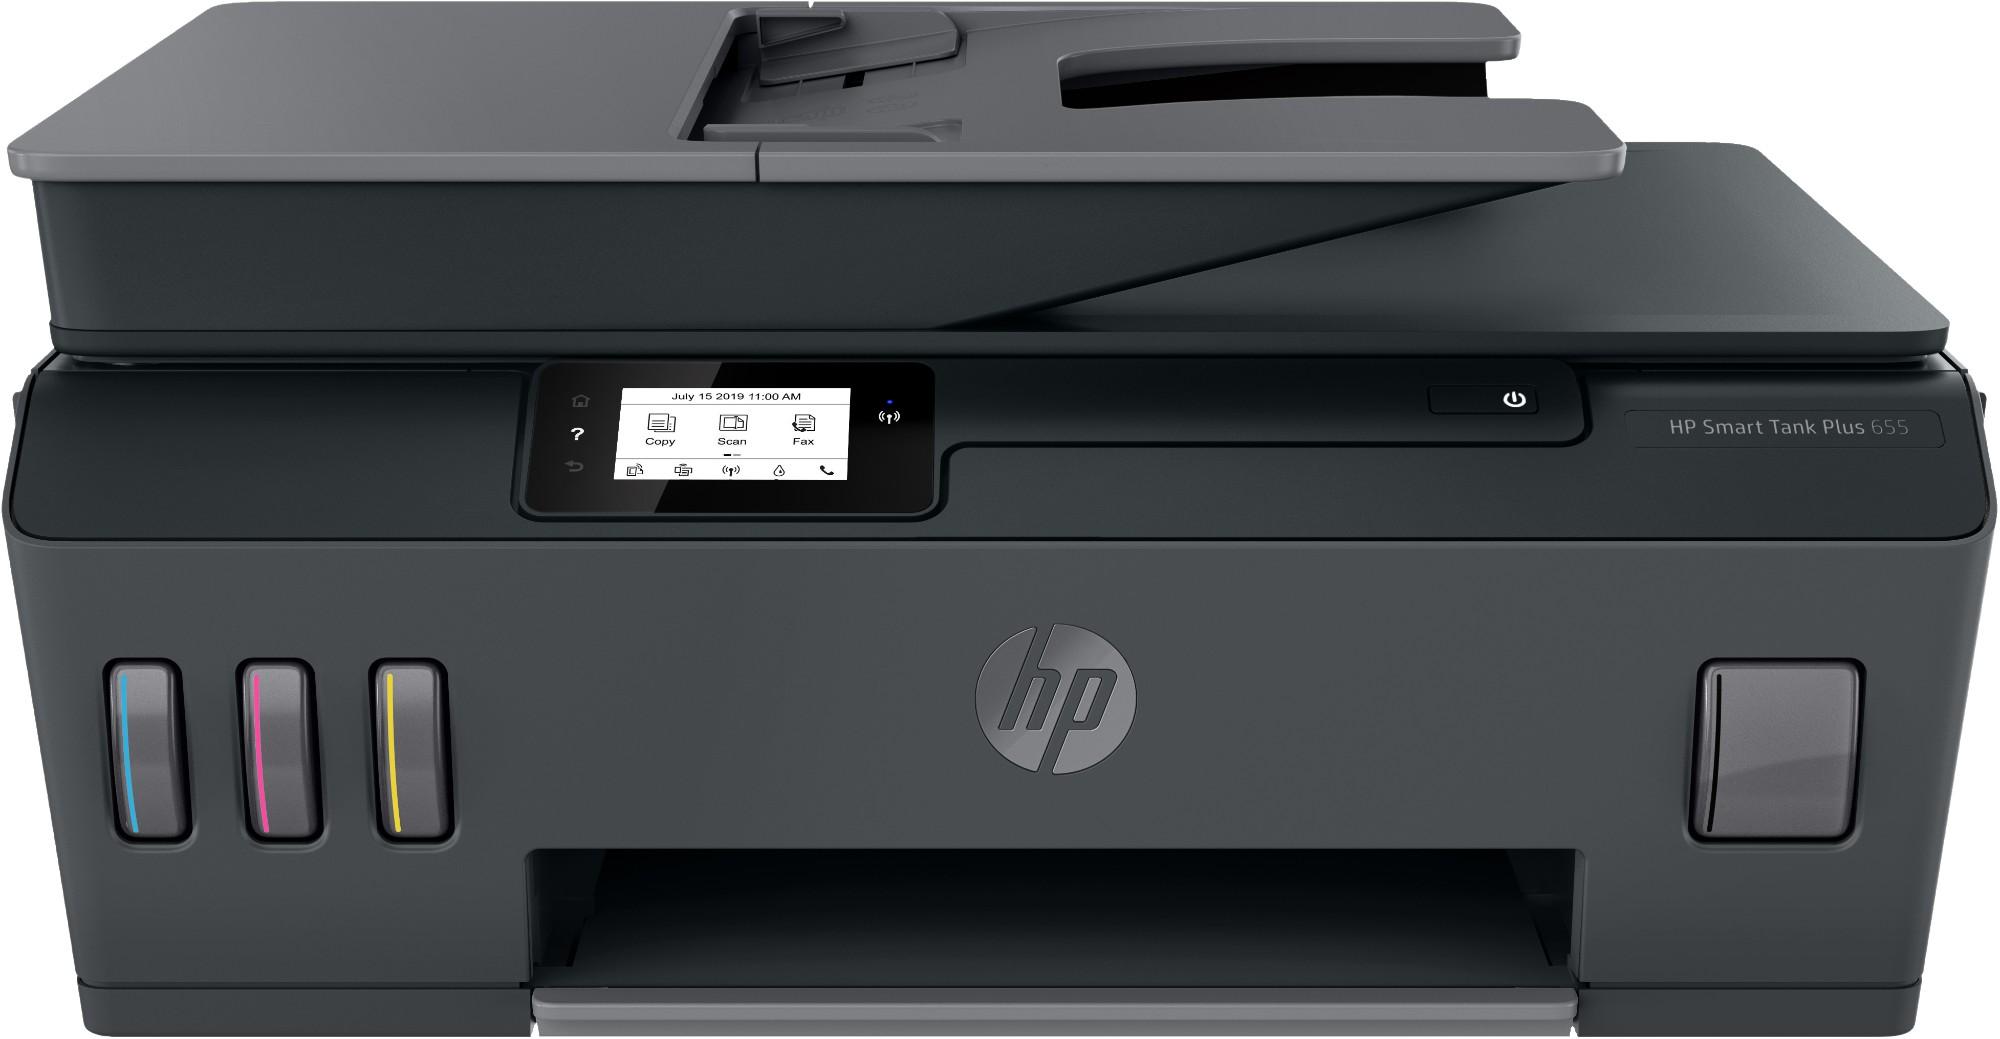 HP Smart Tank Plus 655 Thermal Inkjet 4800 x 1200 DPI 11 ppm A4 Wi-Fi